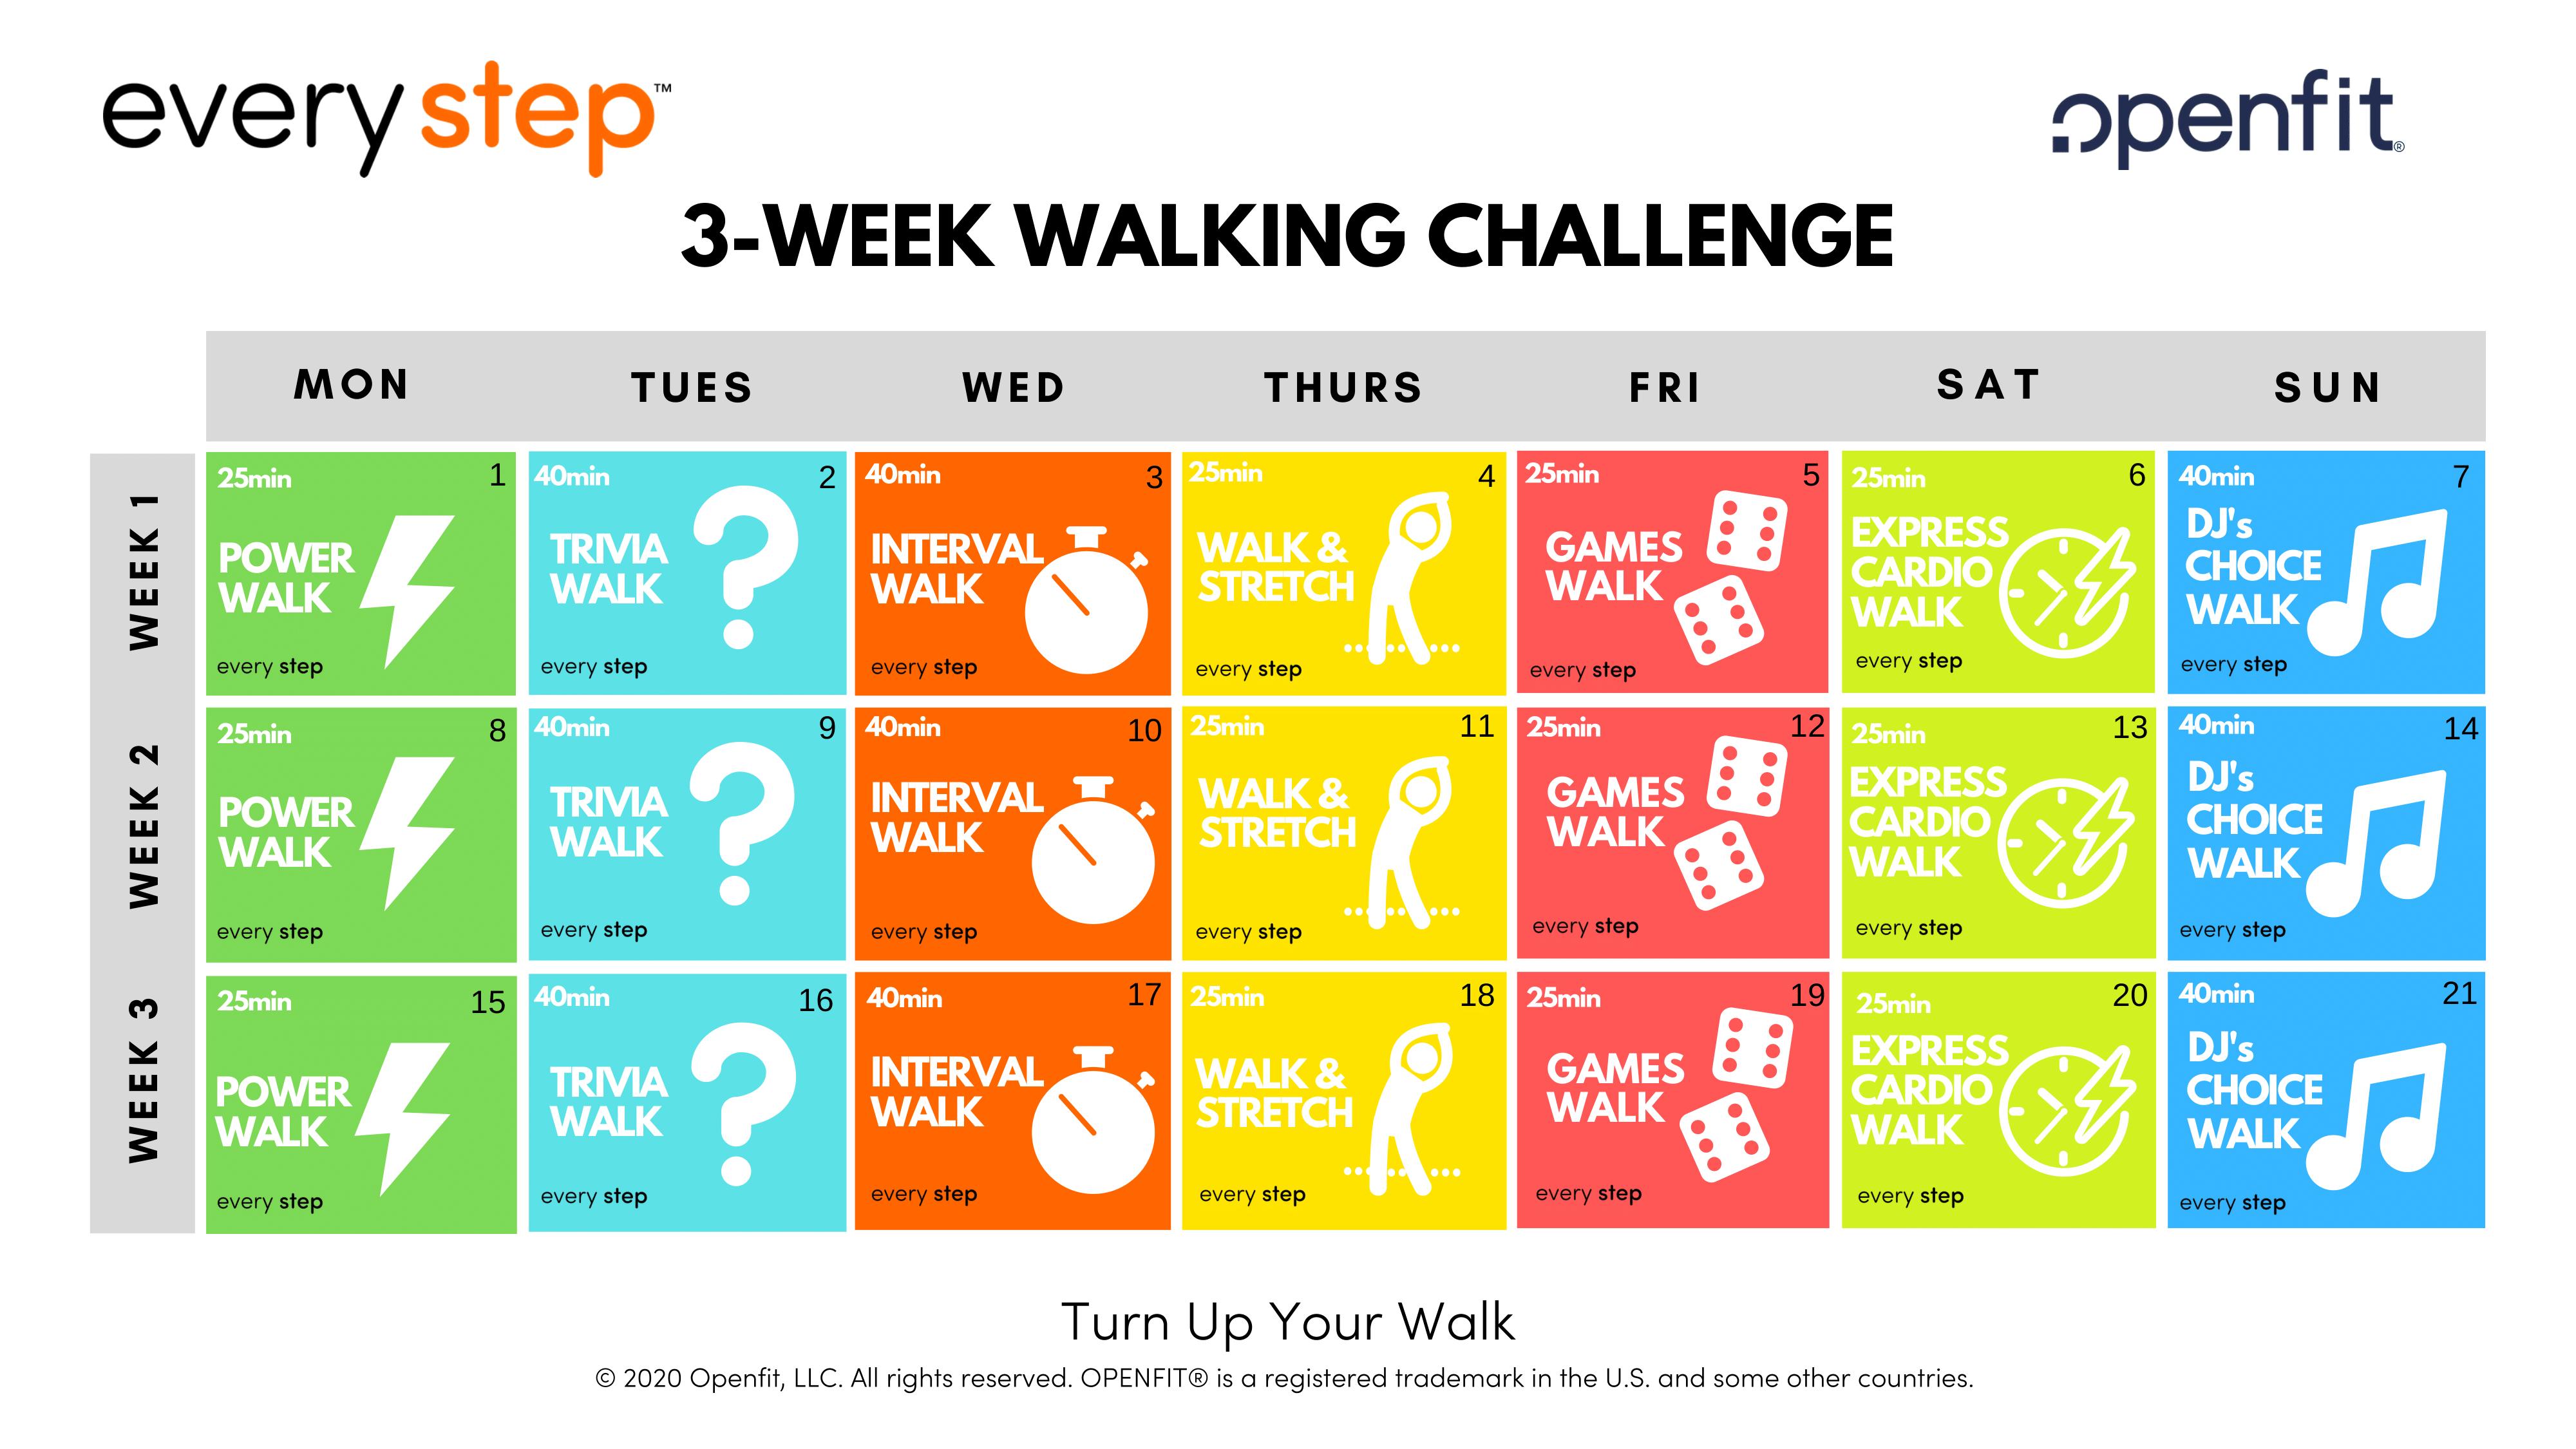 every step workout calendar - every step